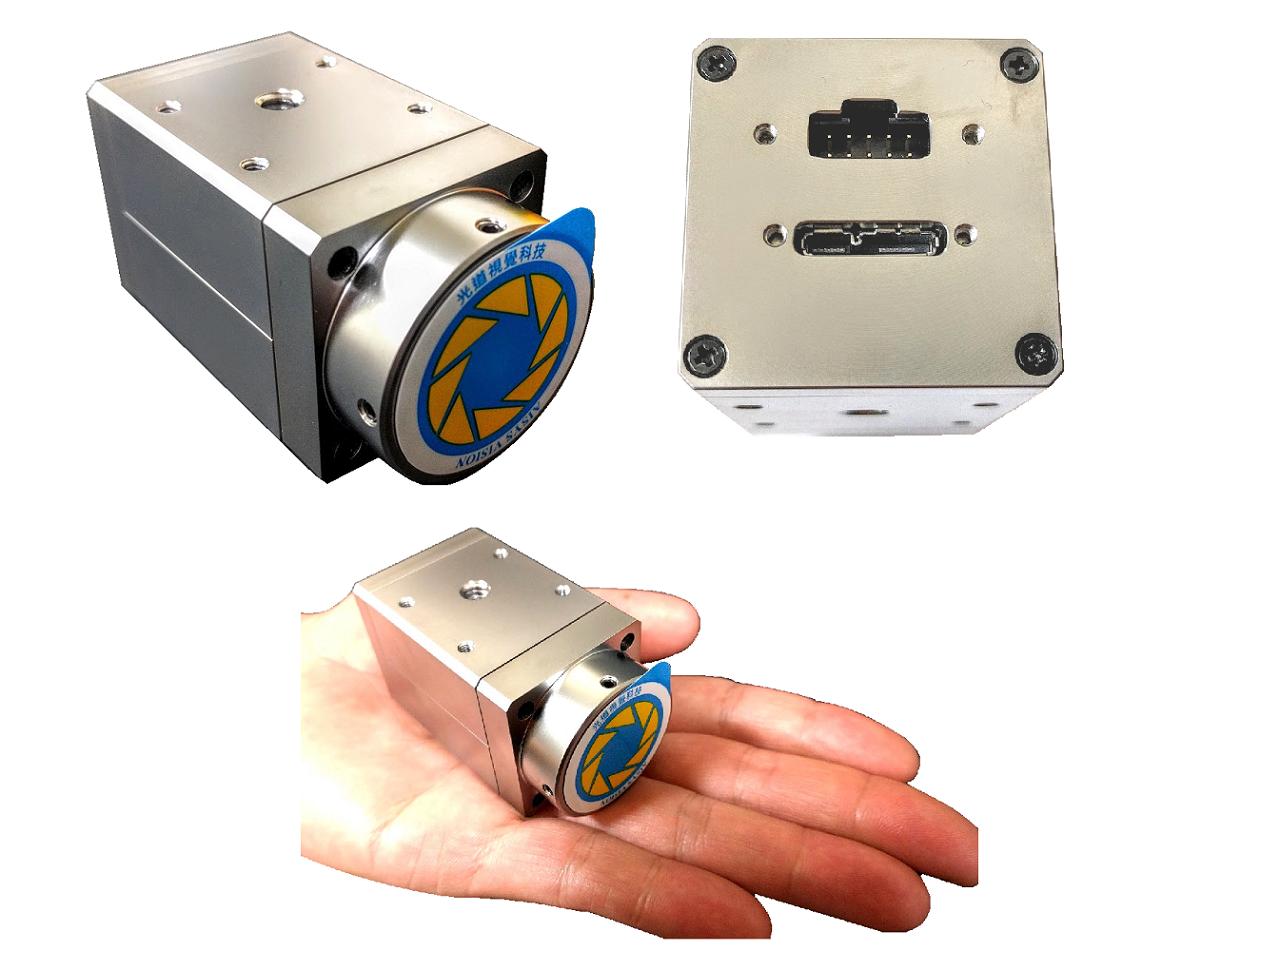 CYCLOPS SU130FC-170攝影機-1.3M像素、非同步式、彩色、內建LED燈源控制器